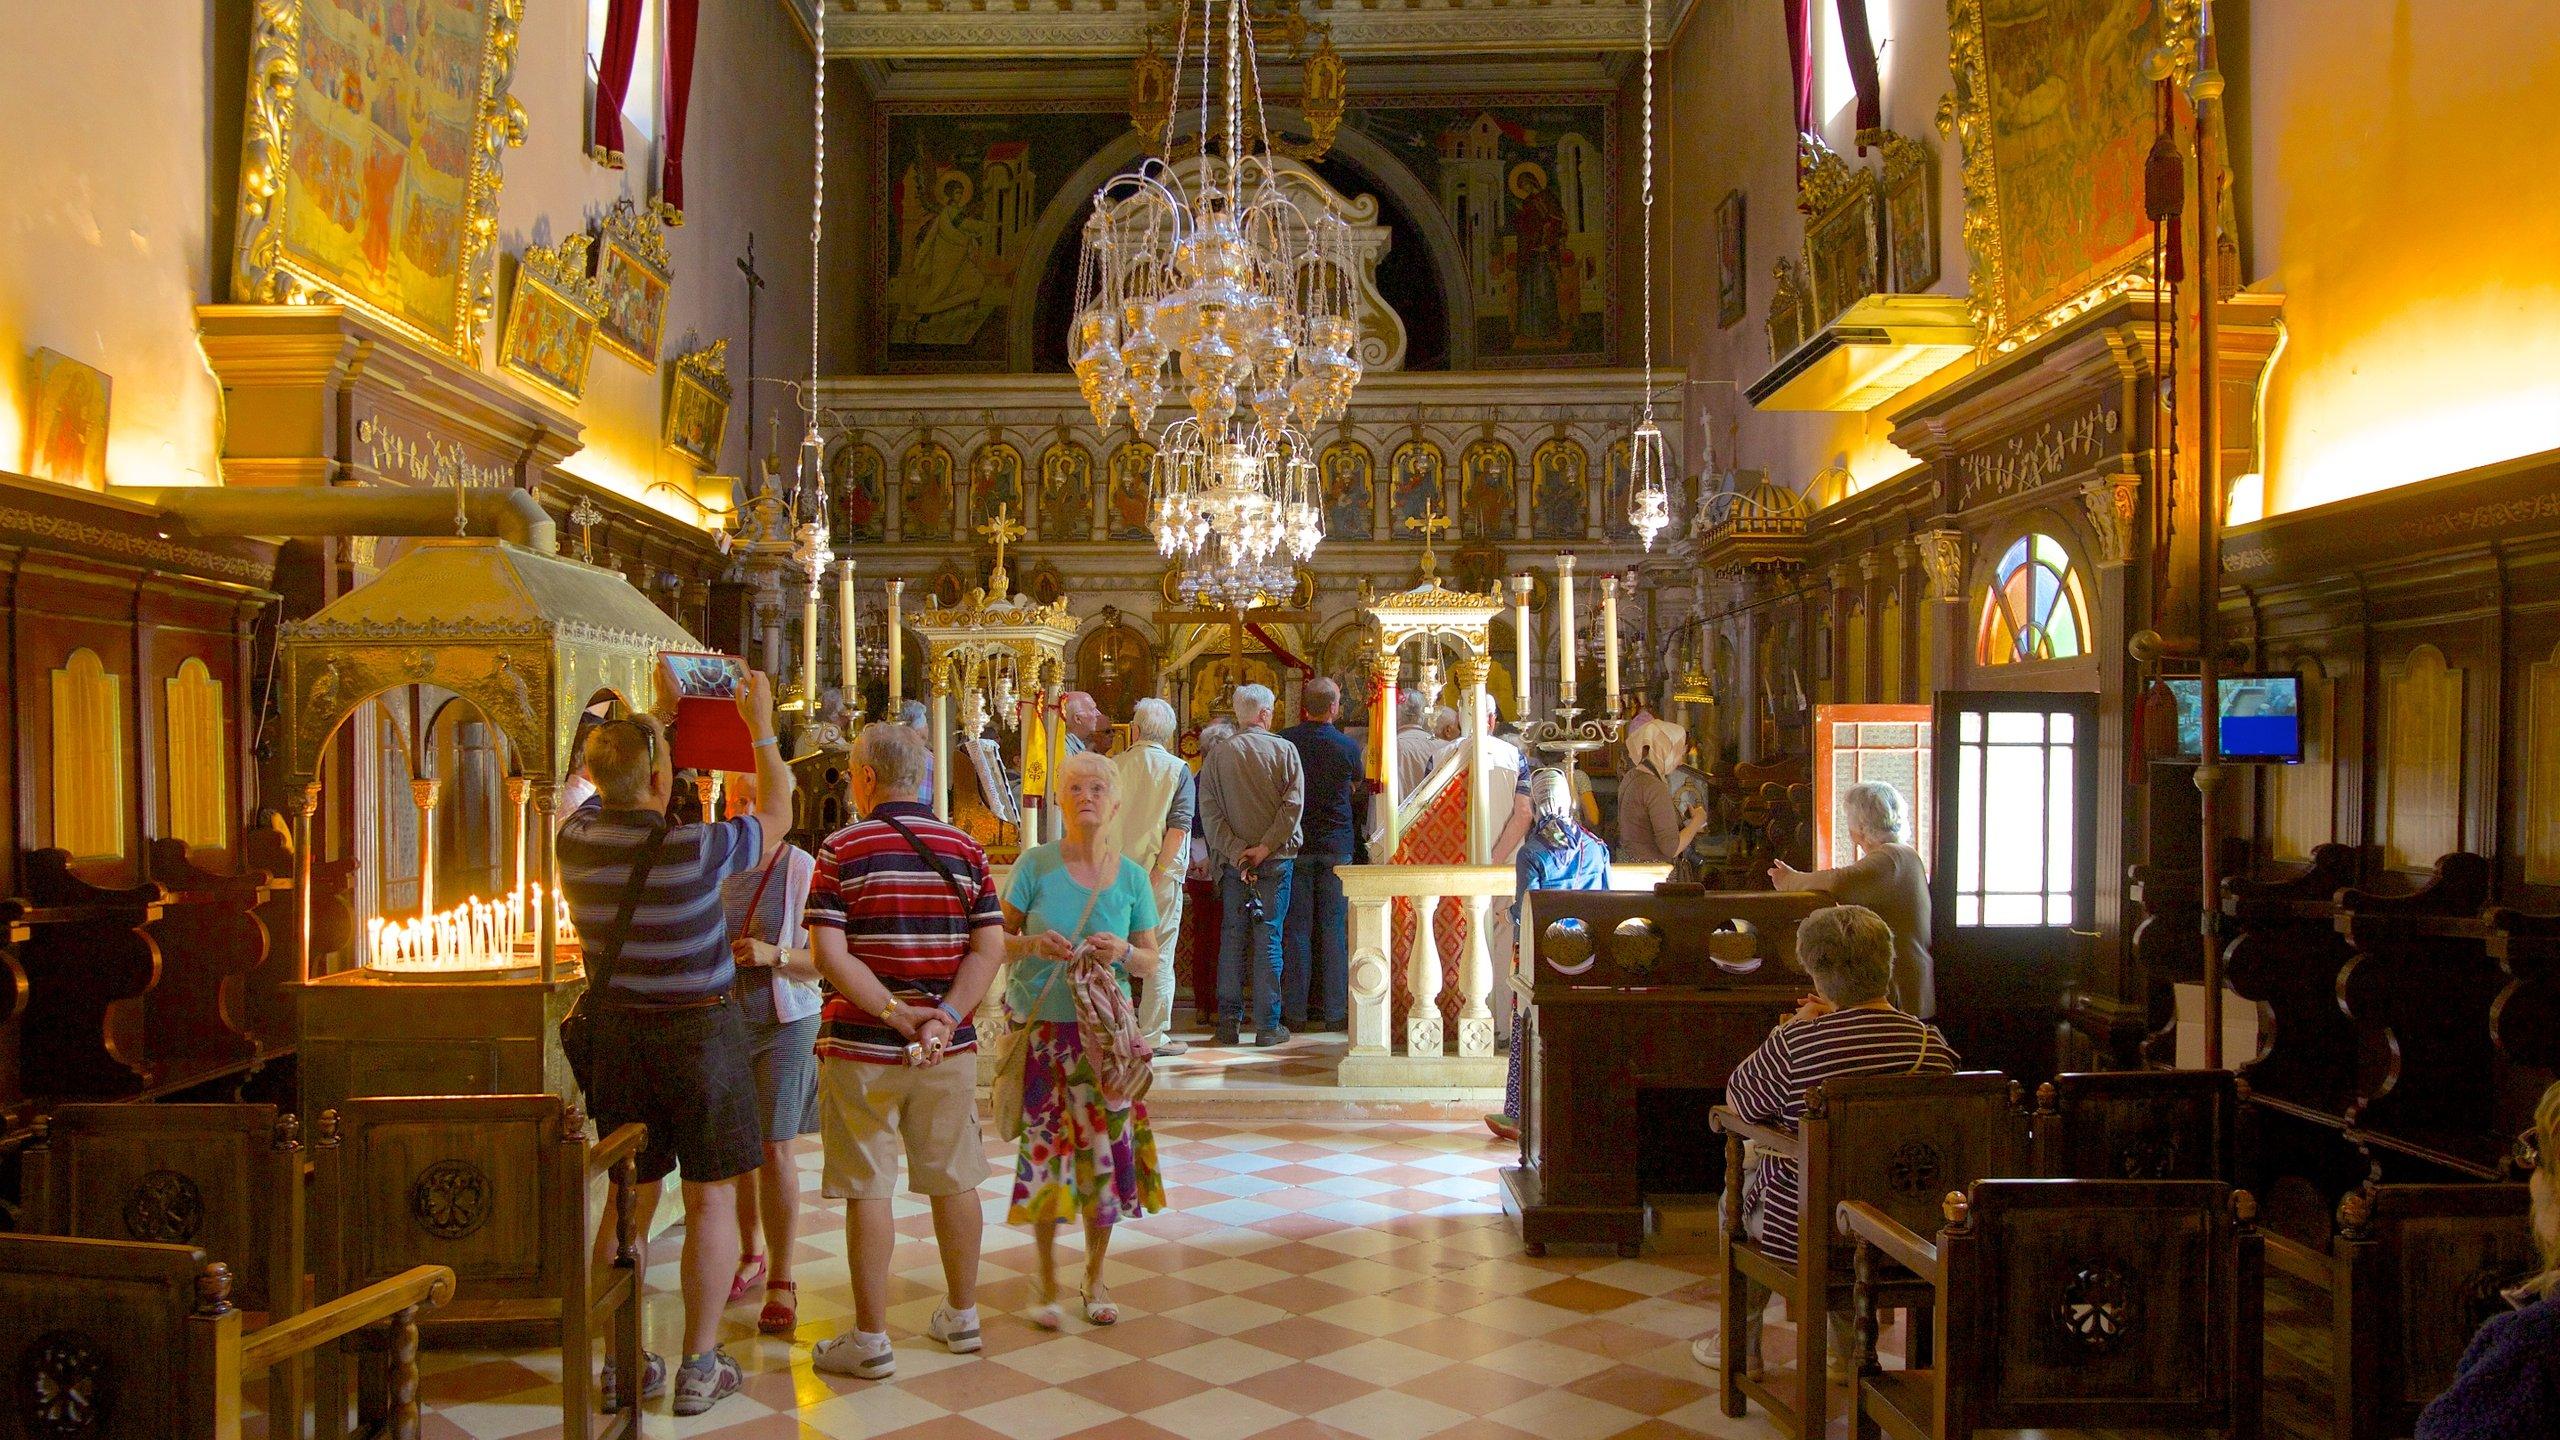 Paleokastritsa Monastery, Corfu, Ionian Islands Region, Greece